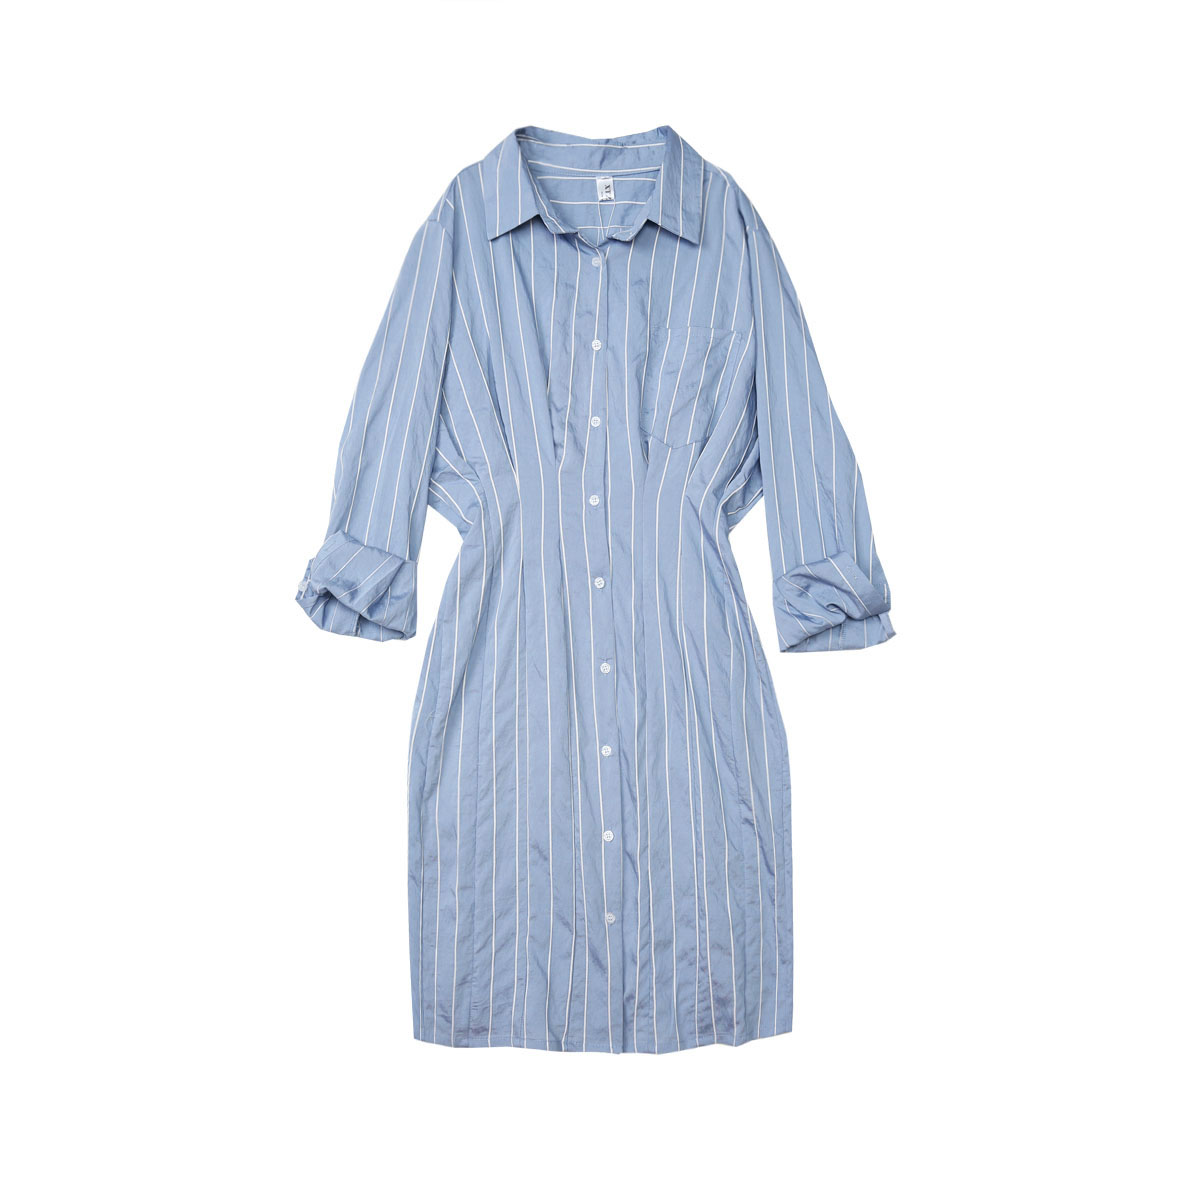 Attav polo蓝白条衬衫裙2018夏季棉质翻领竖条纹收腰连衣裙中长款